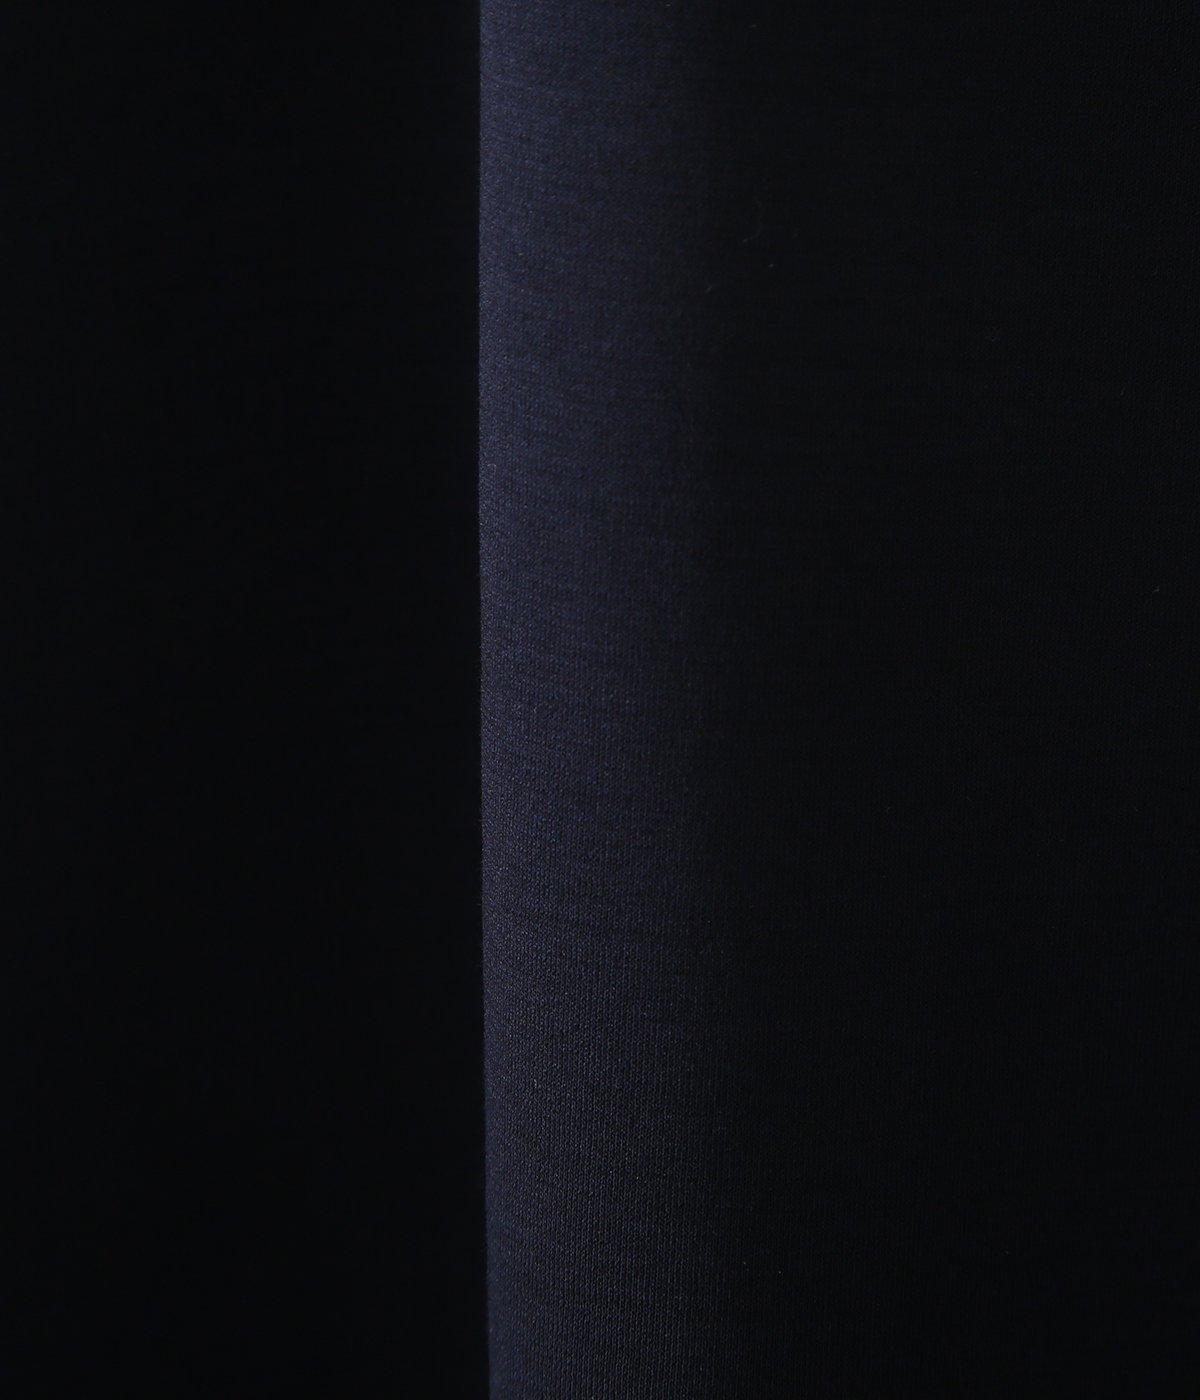 COTTON PONTE / V NECK L/S TEE